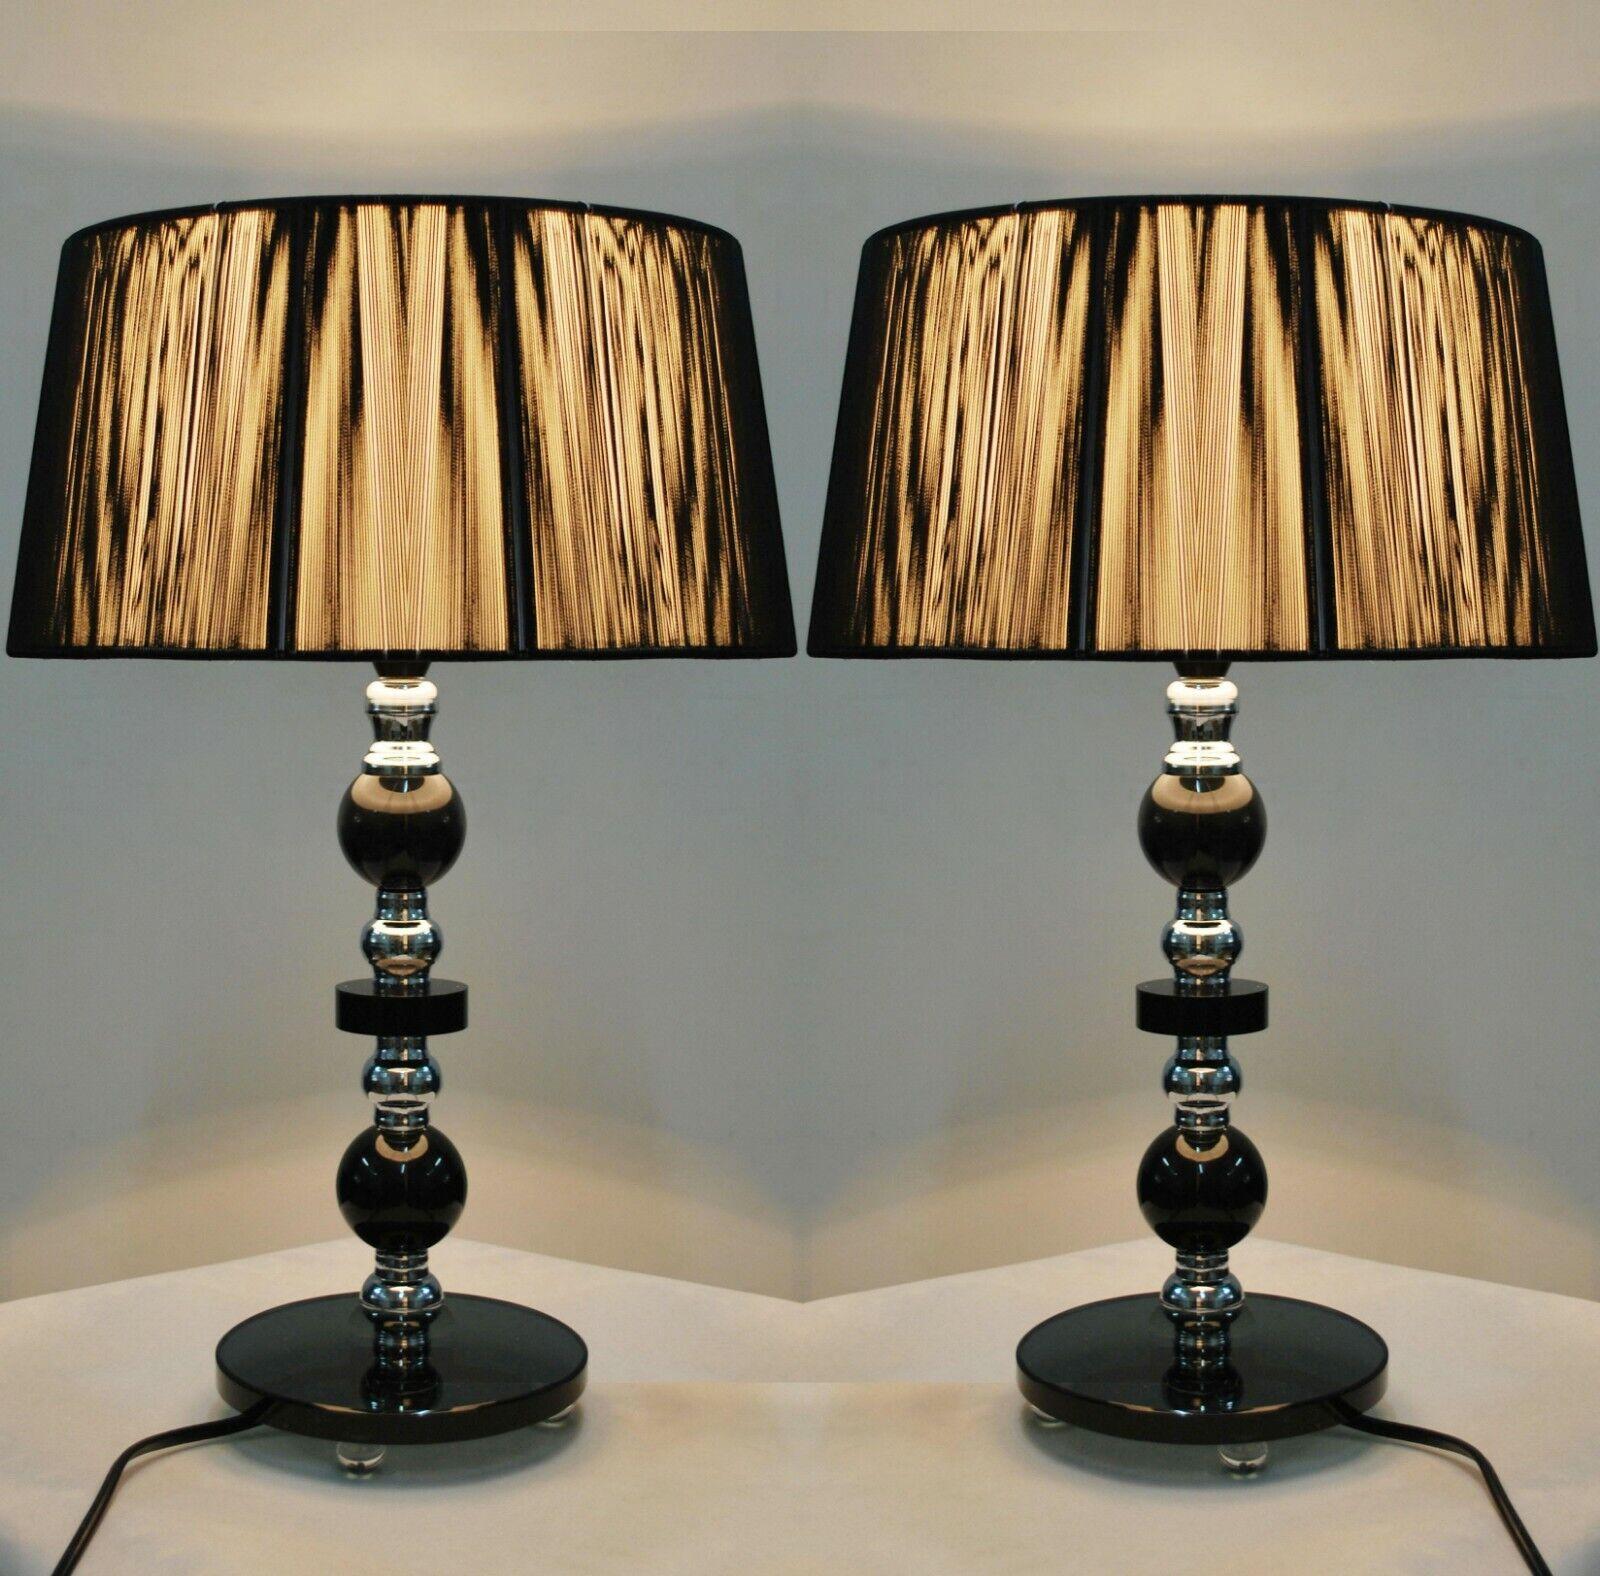 Bedside Table Designer Modern Lamps, Bedside Lamps With Dimmer Switch Australia